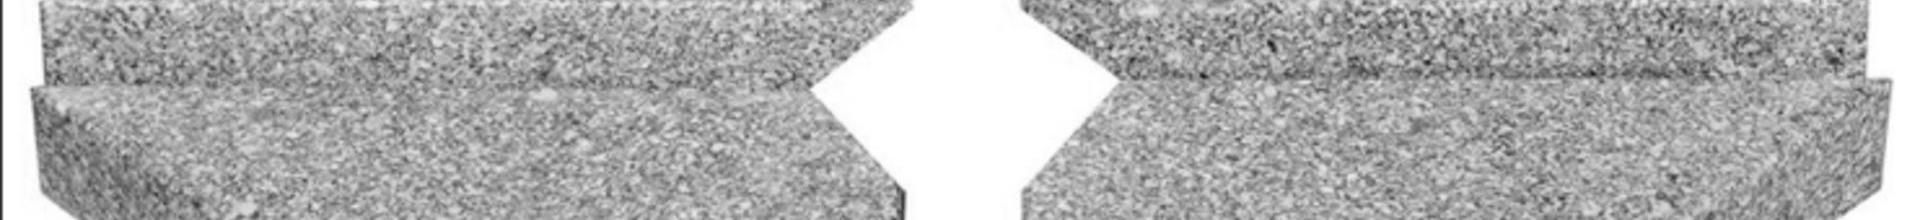 25kg Triangular Bases